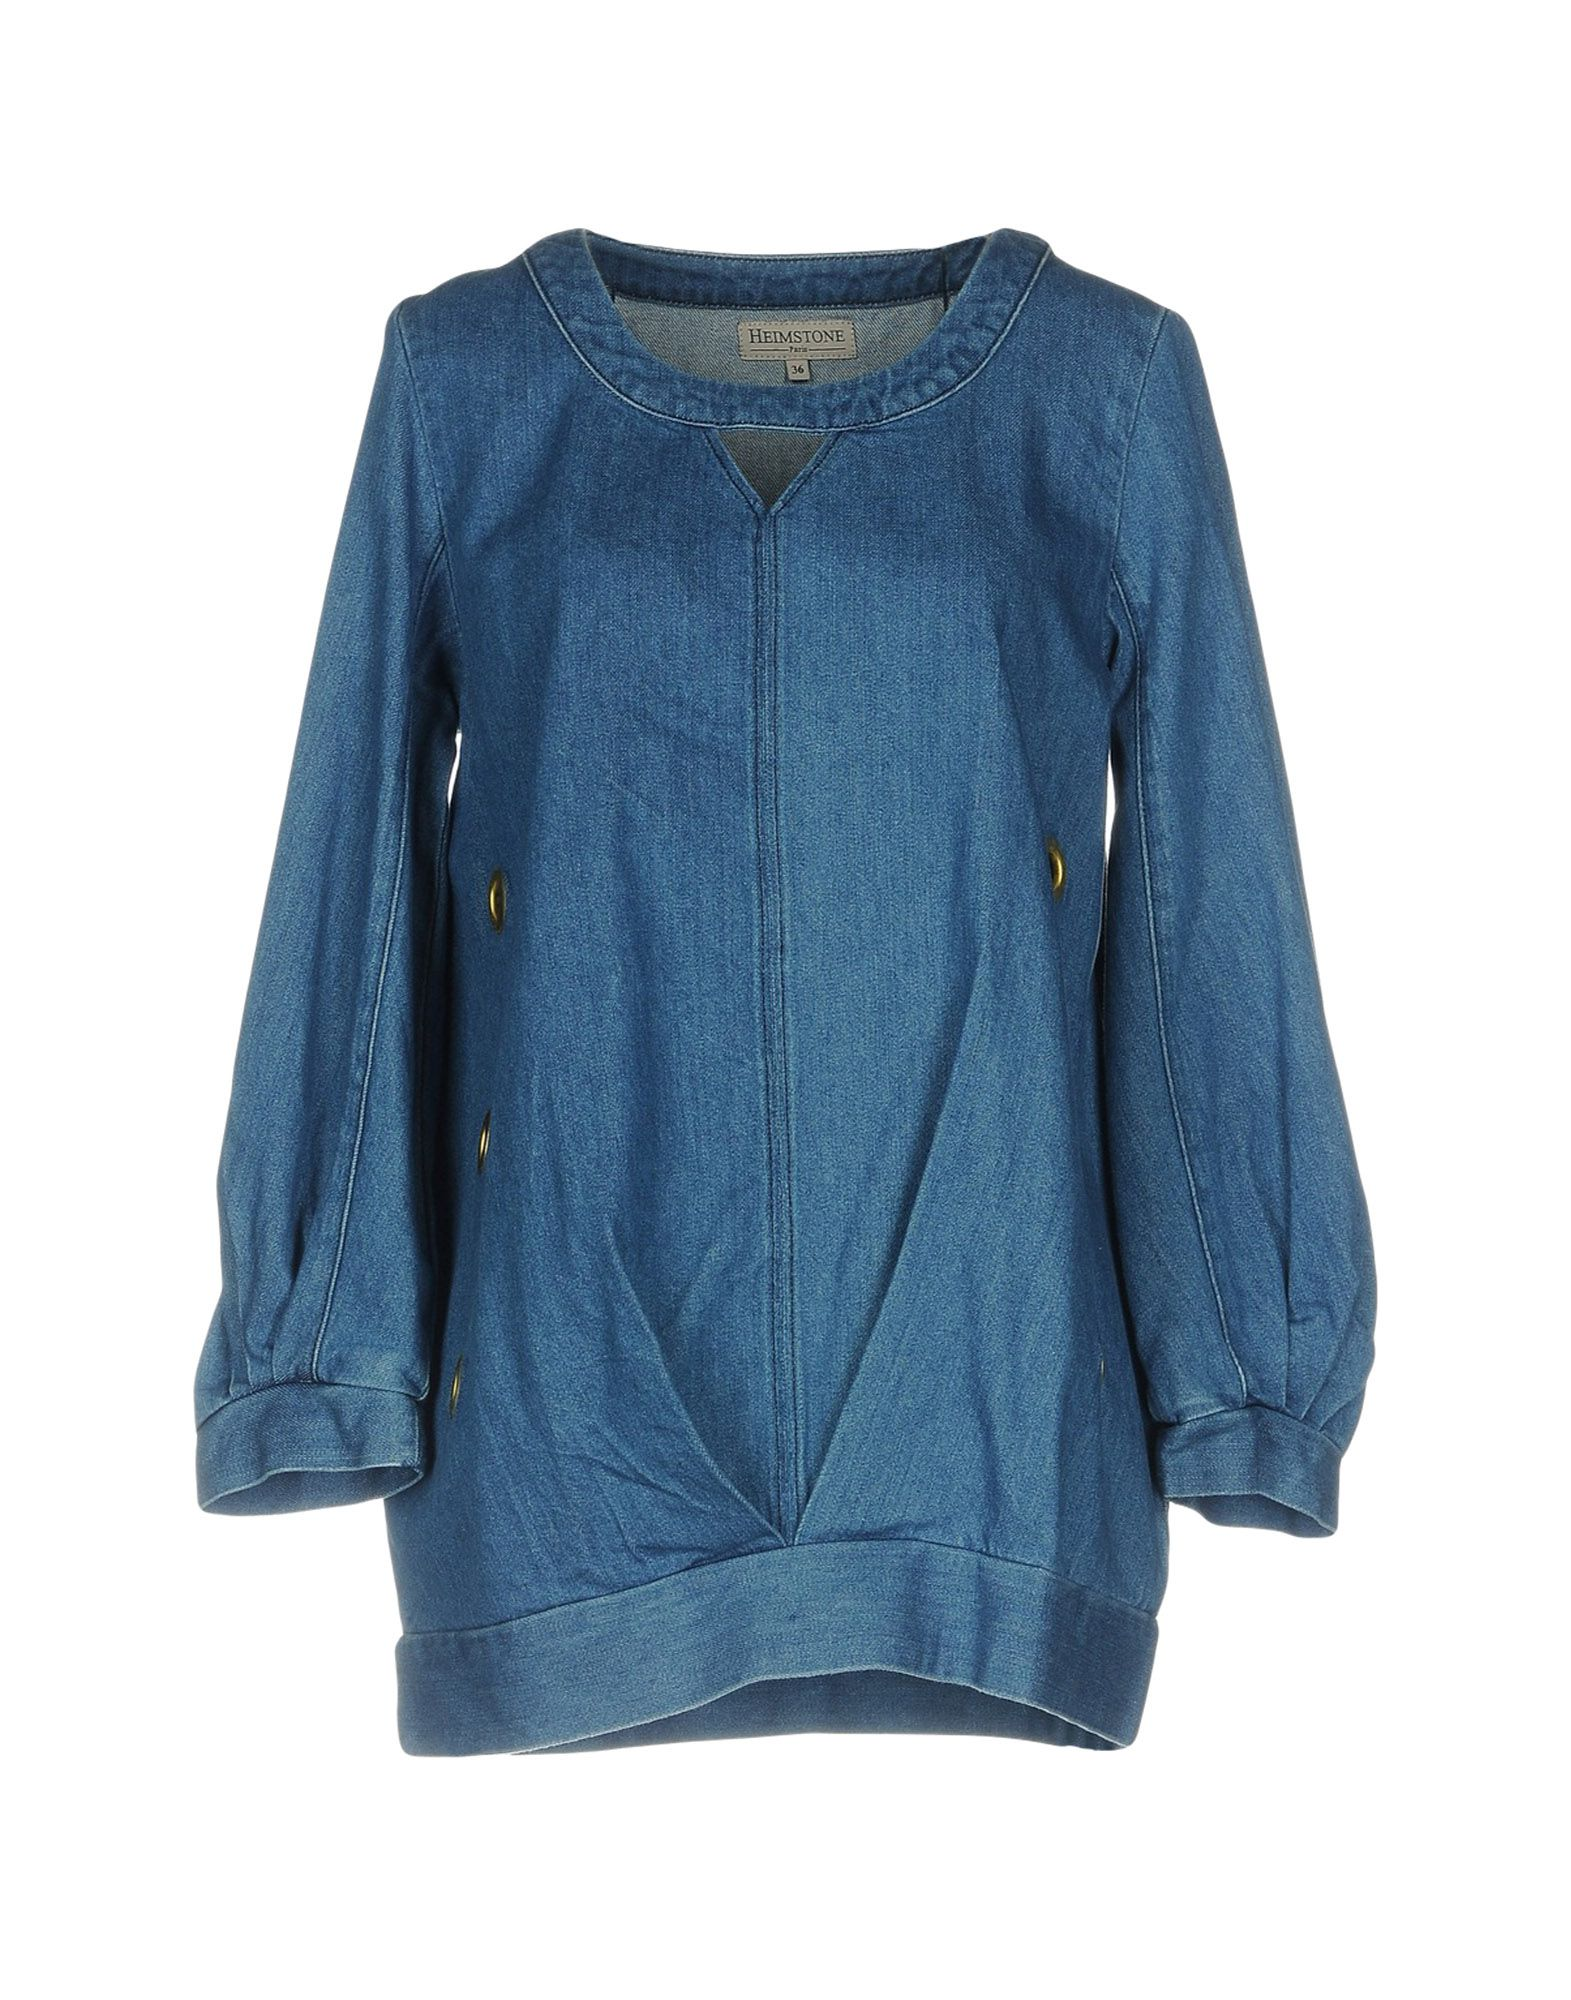 HEIMSTONE Джинсовая рубашка цена 2017